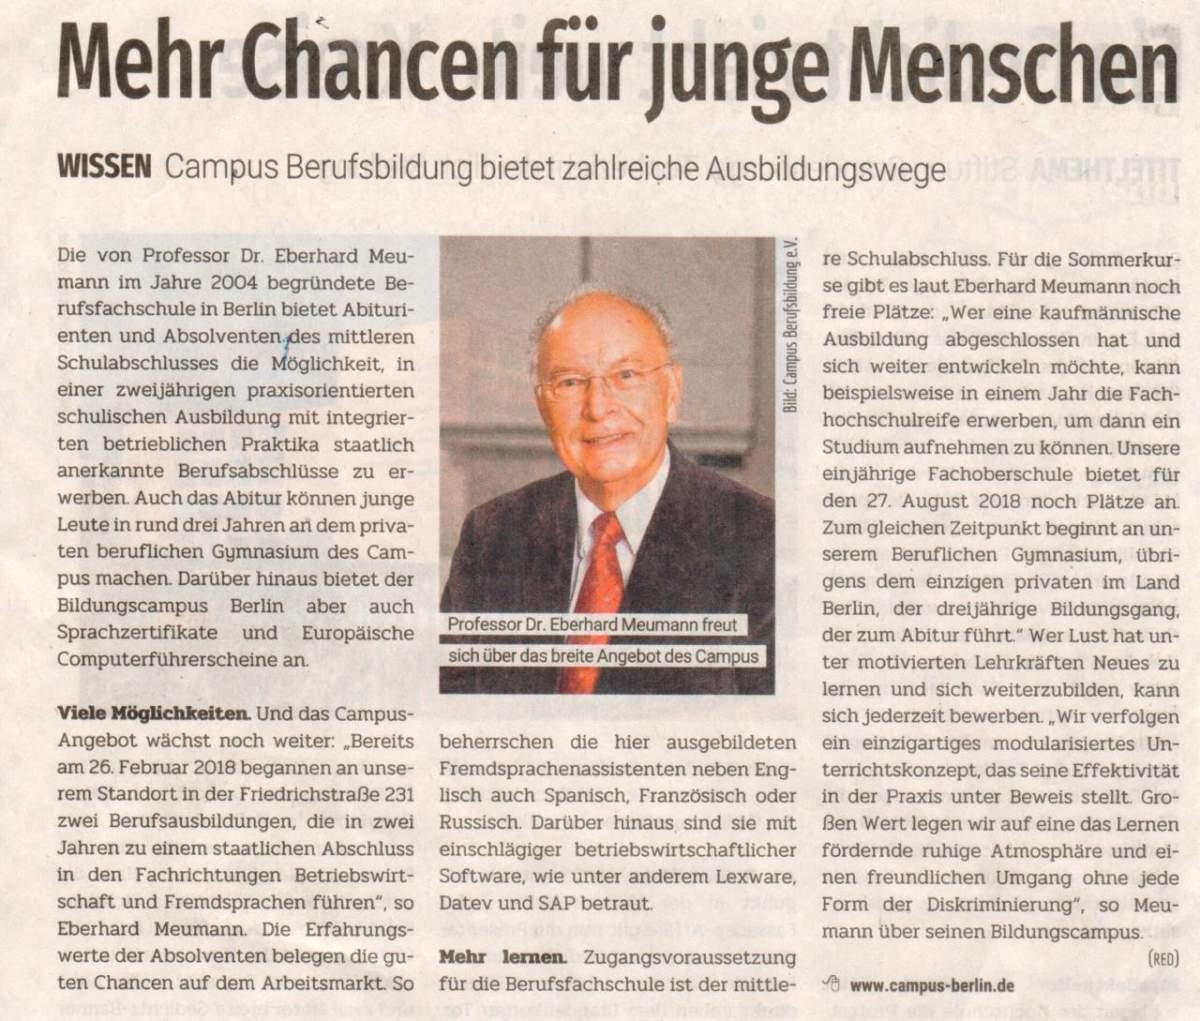 Campus Berlin im Berliner Abendblatt